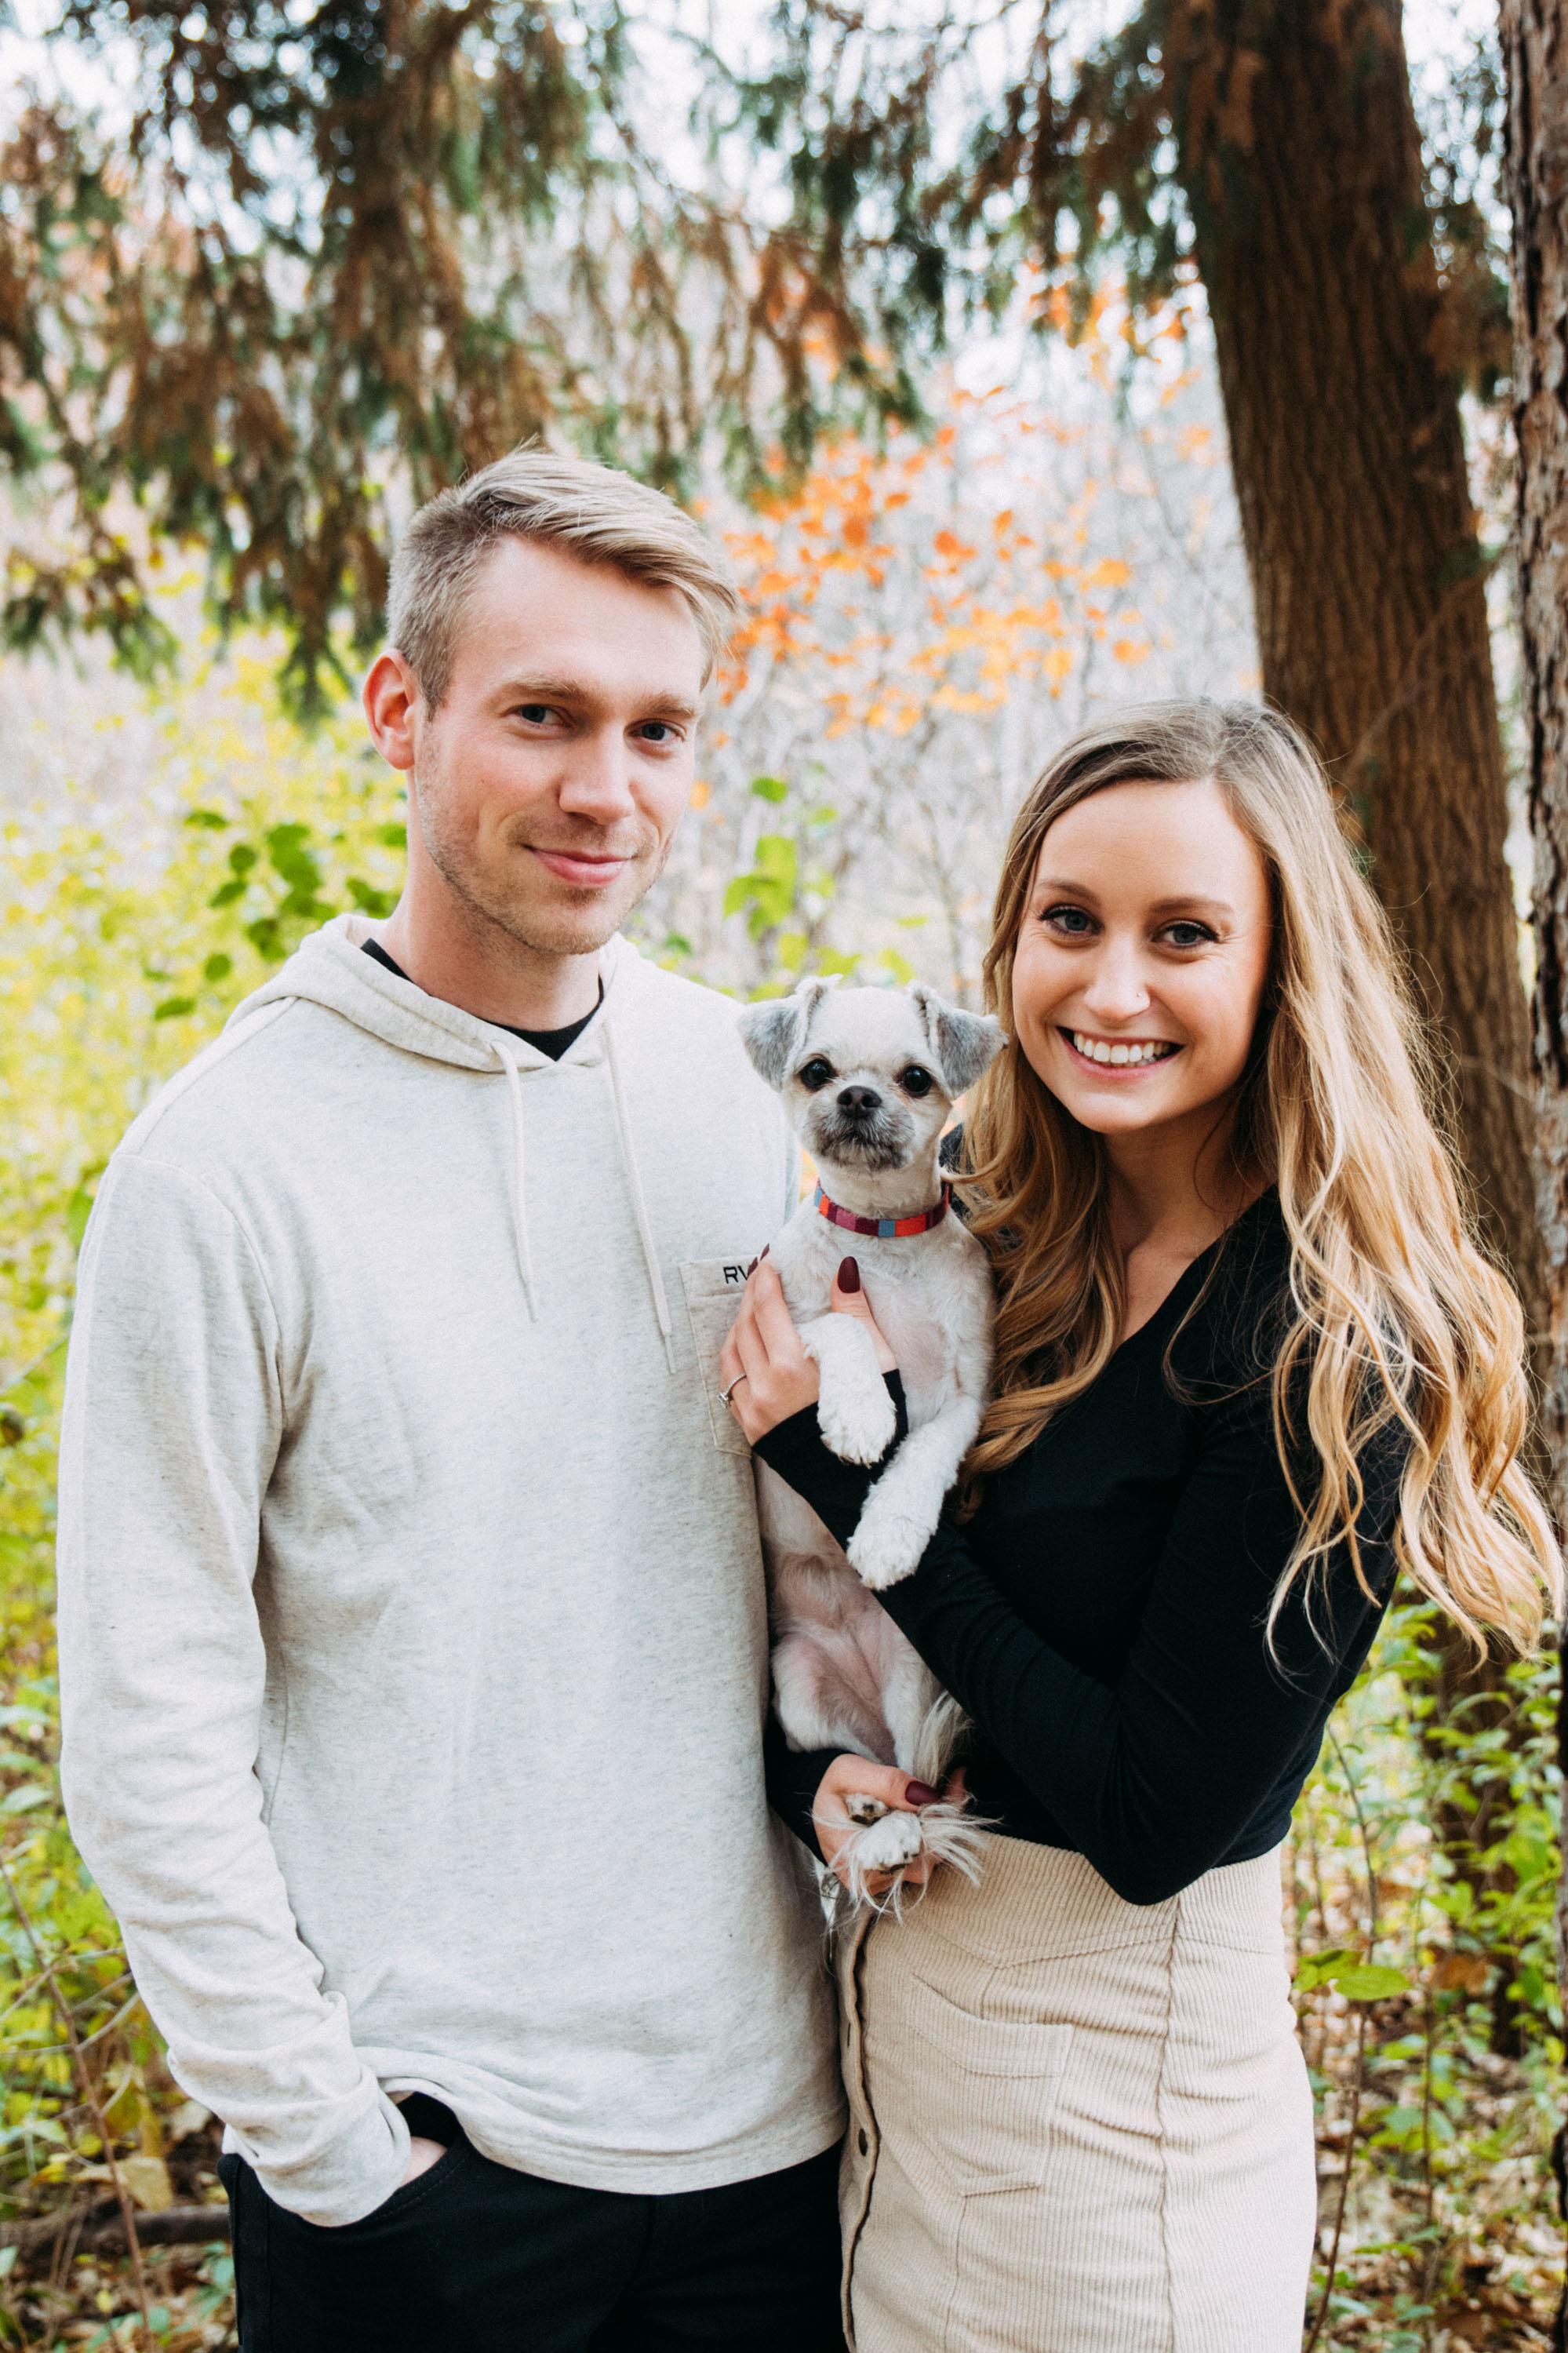 15-Dogs_at_Engagement_Photos_Minnesota.jpg